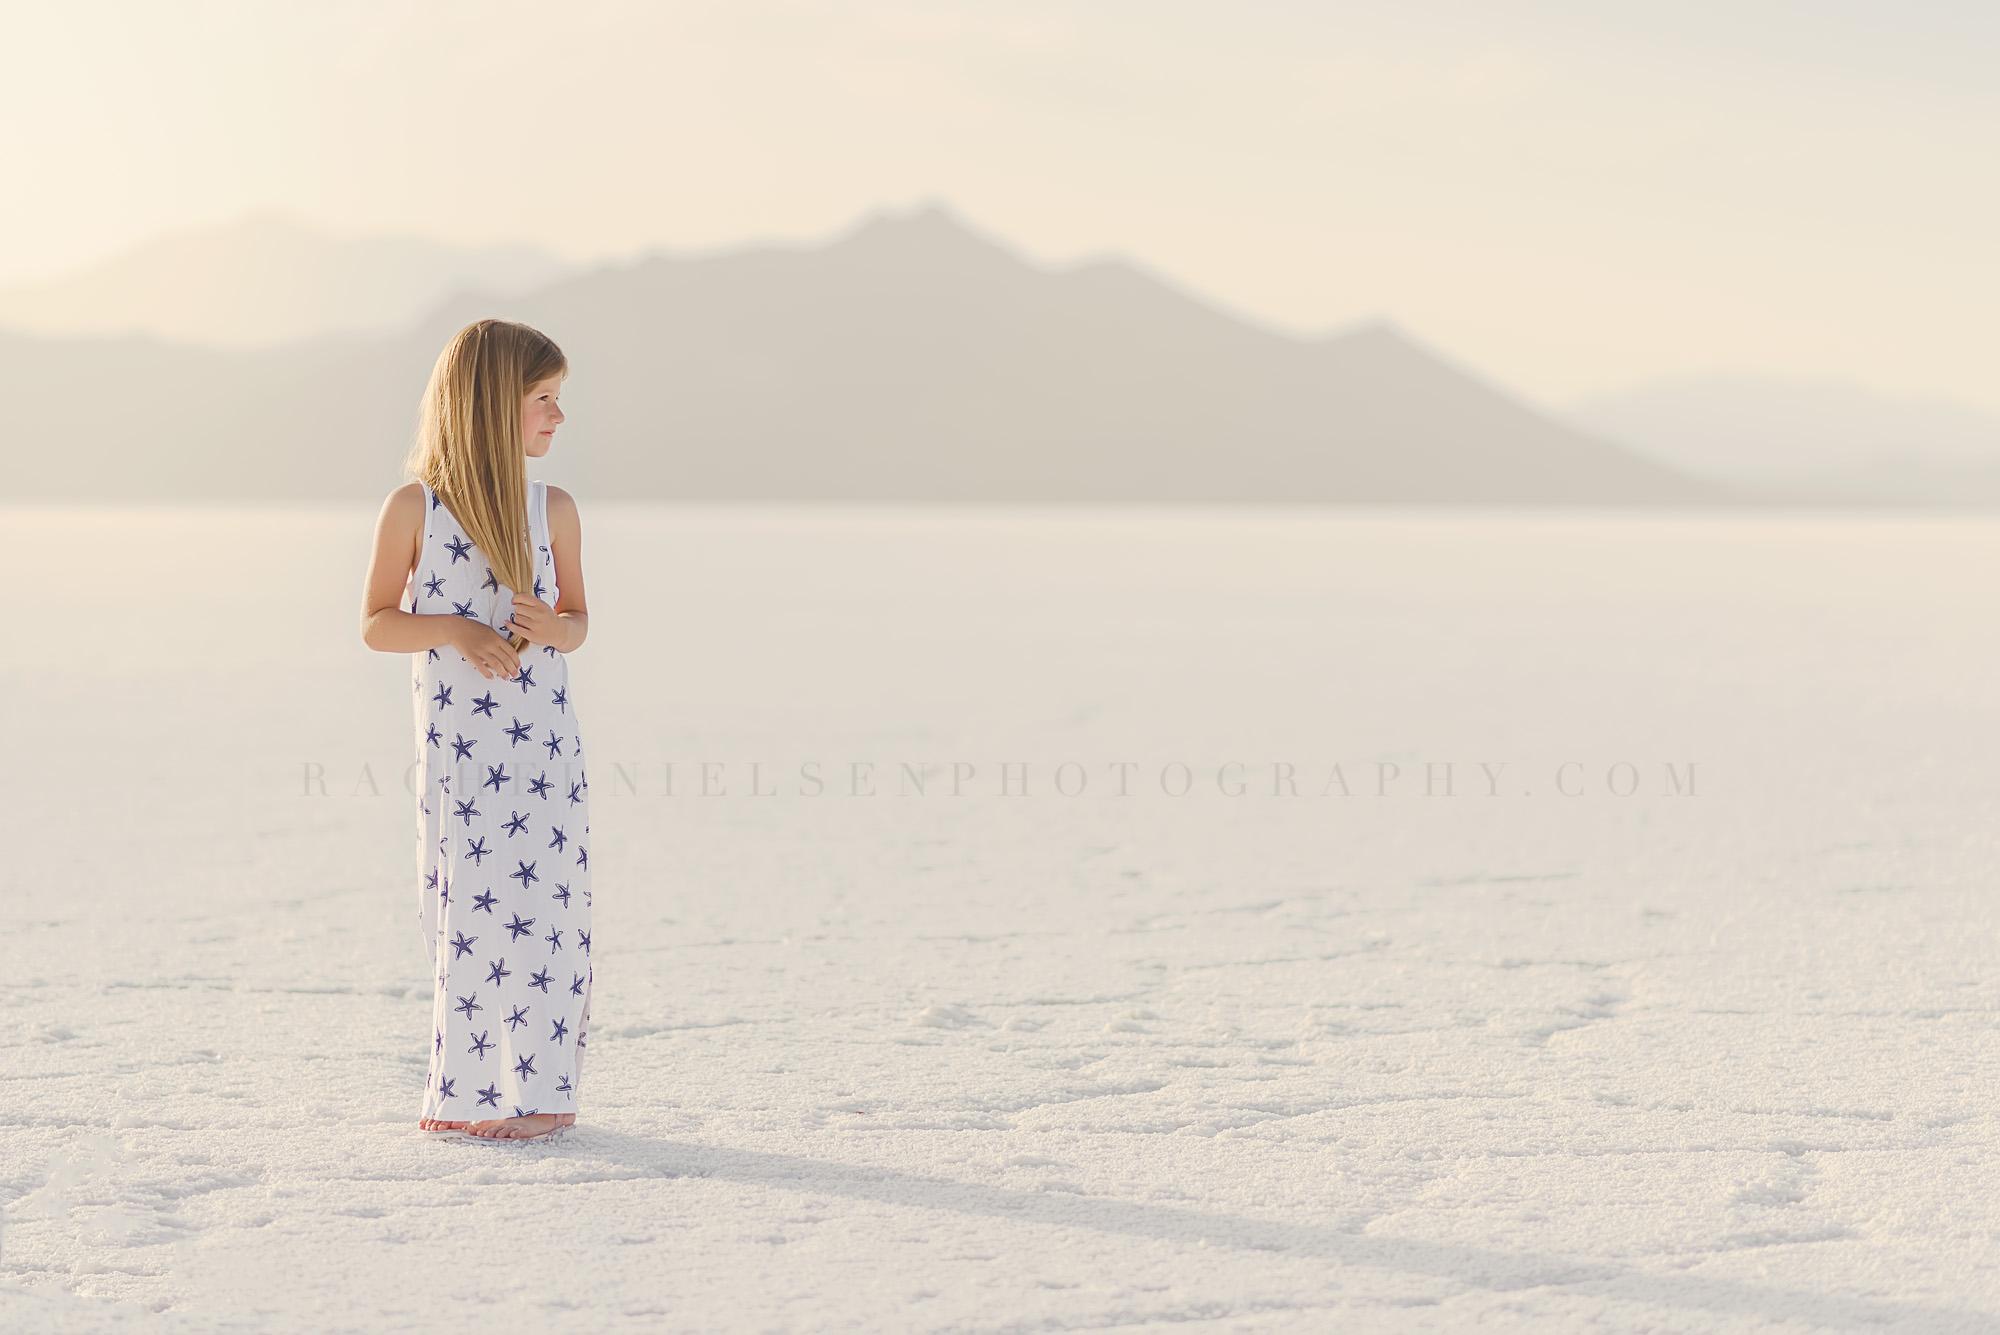 Salt Flats photographer